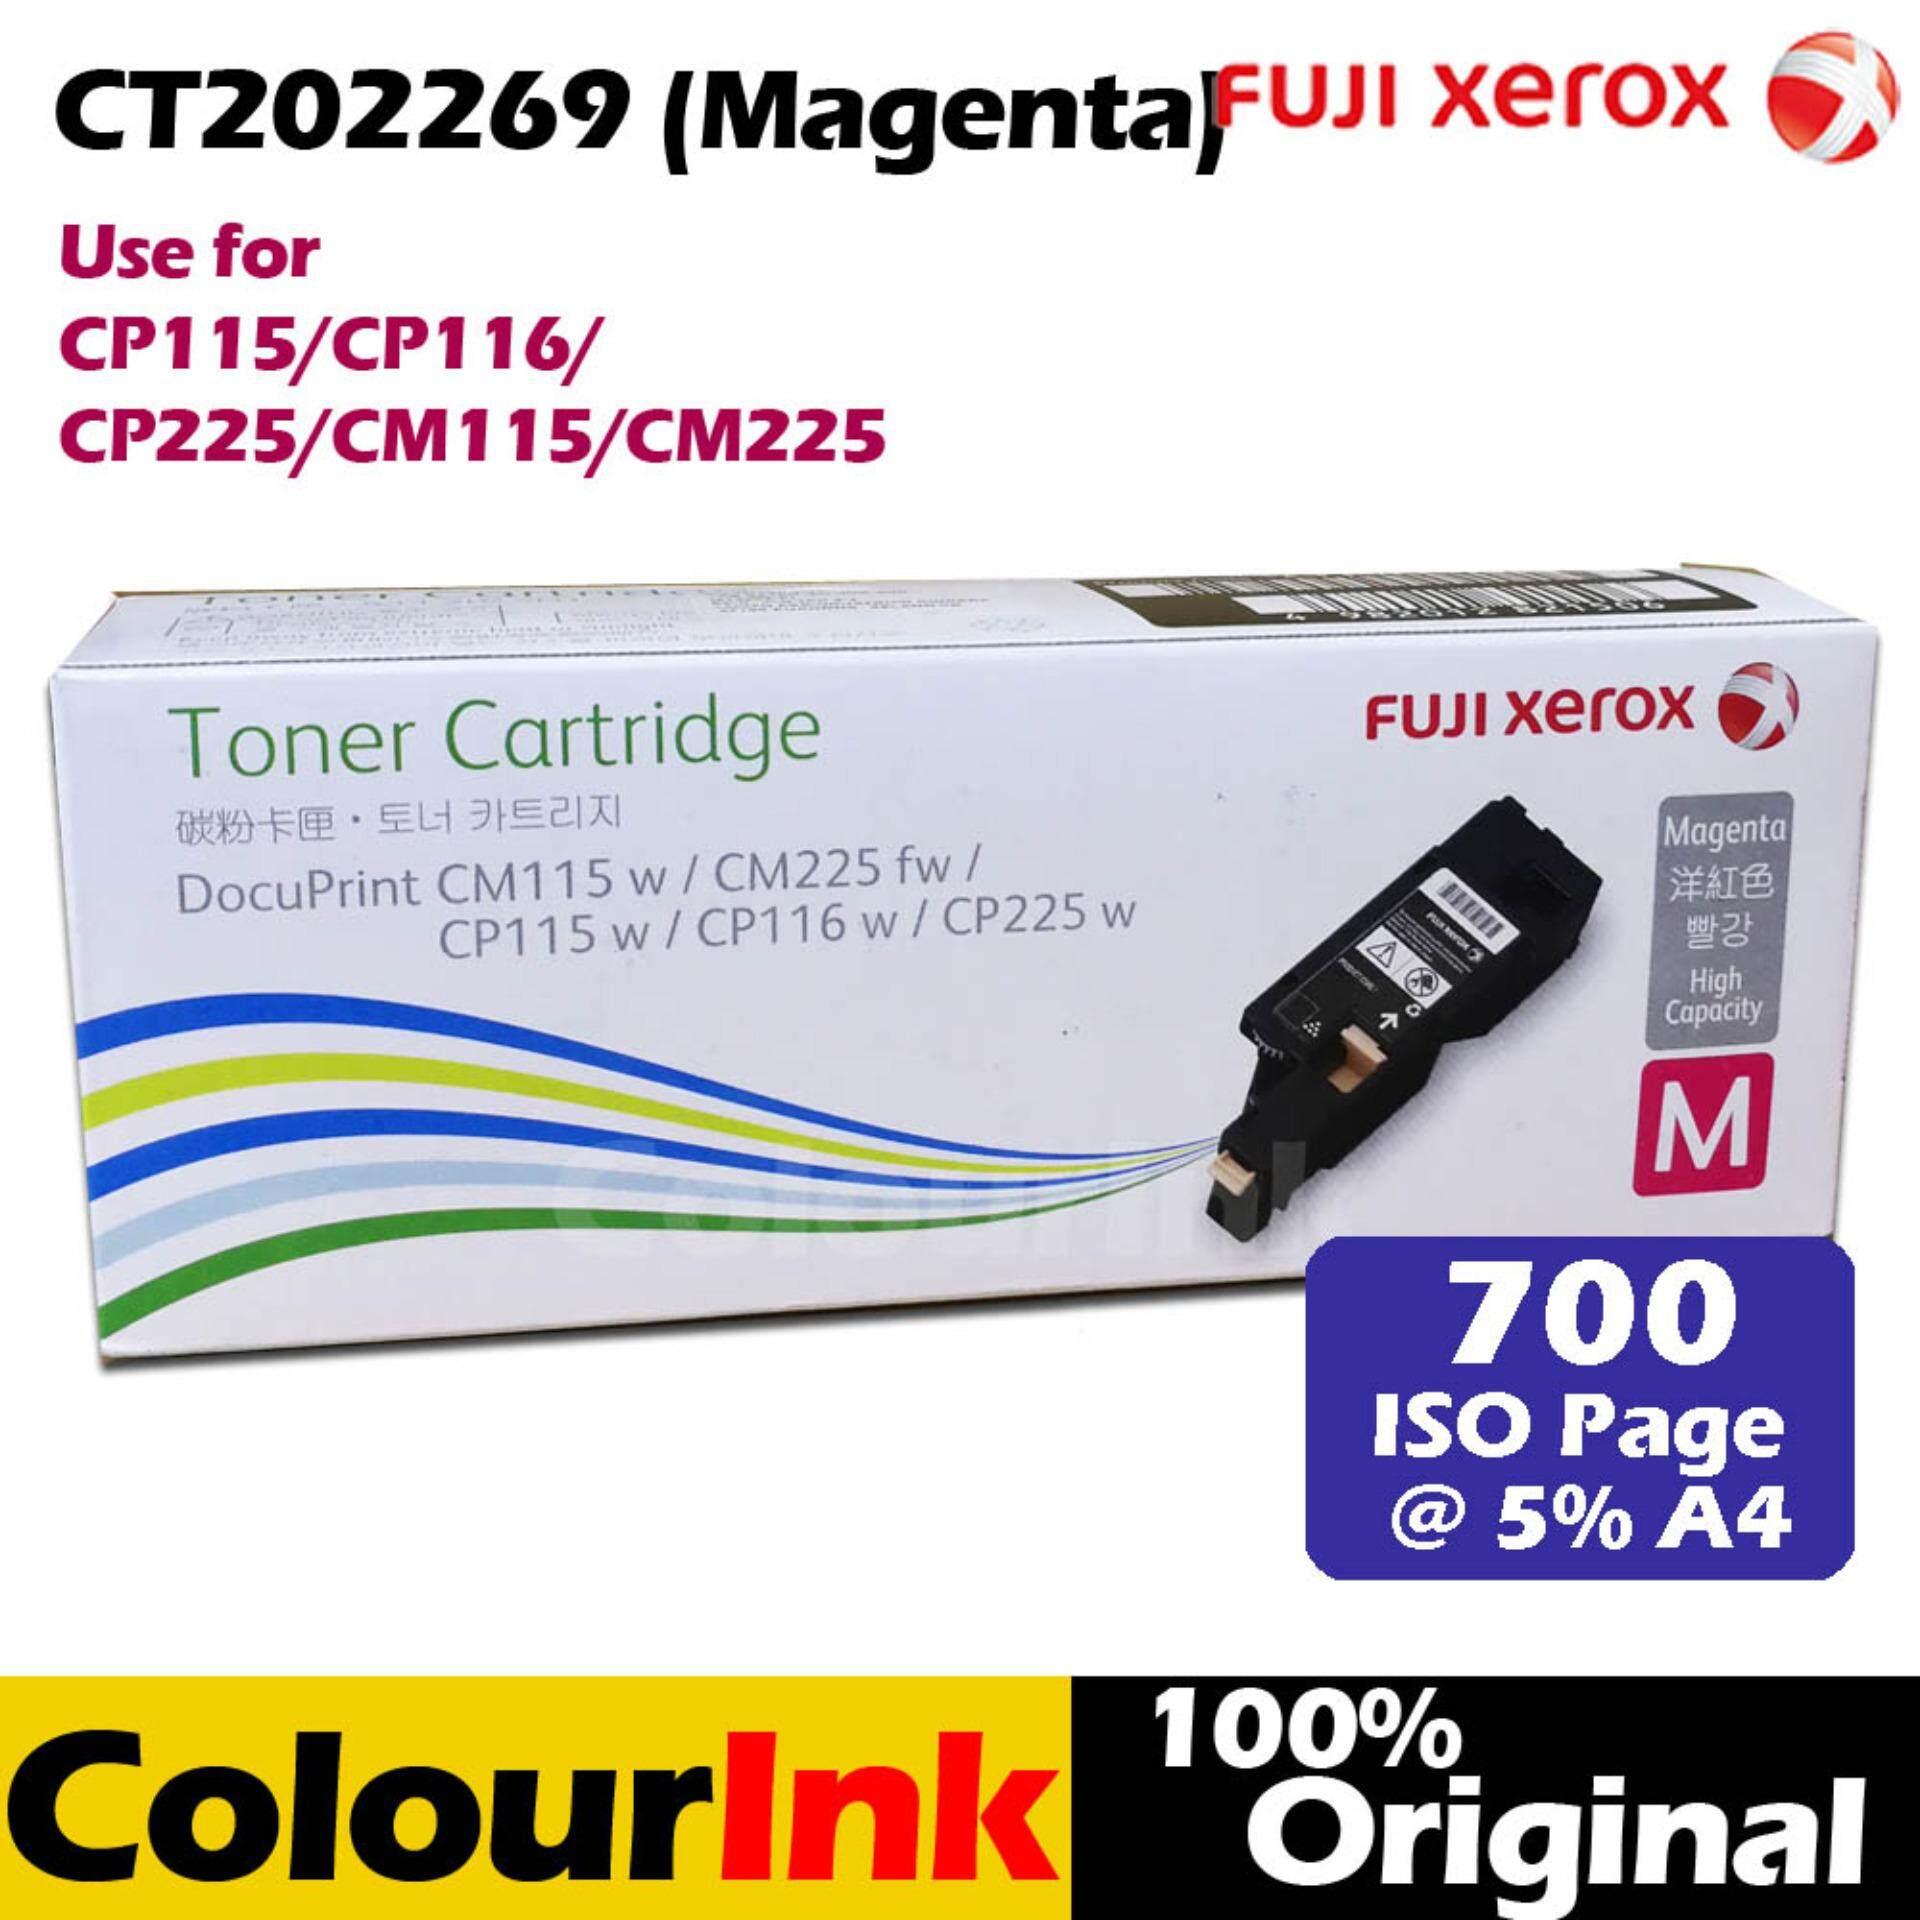 Fuji Xerox Ct202269 Low Original Magenta Toner Cp115w Cp225w Docuprint Cm115w Cm225fw